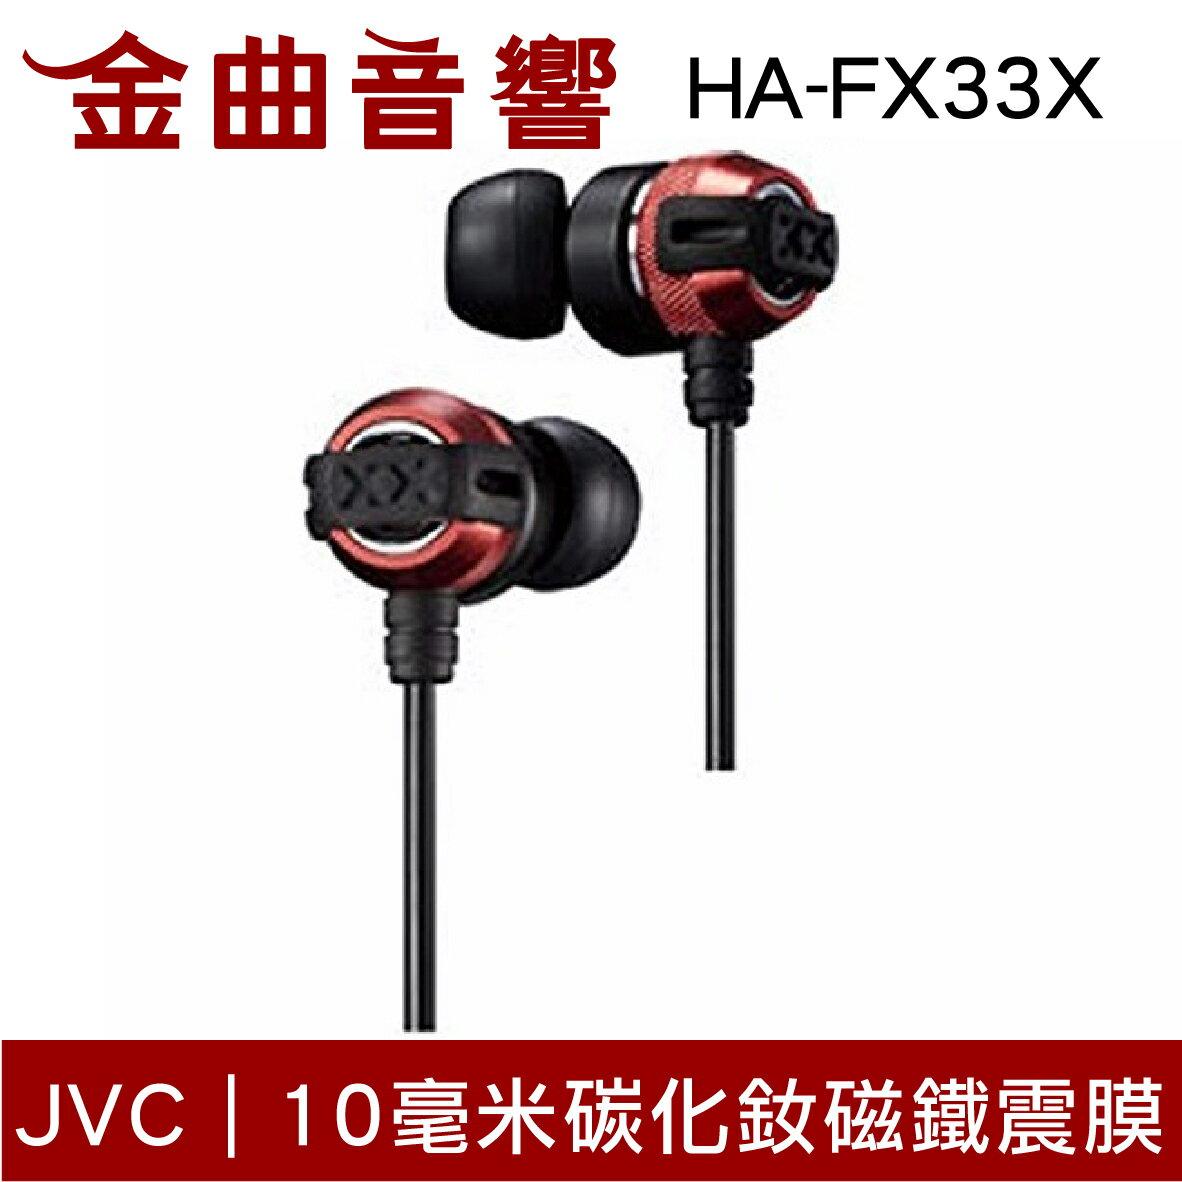 JVC 超重低音系列 HA-FX33X 紅黑 噪音隔離 耳道式耳機 | 金曲音響